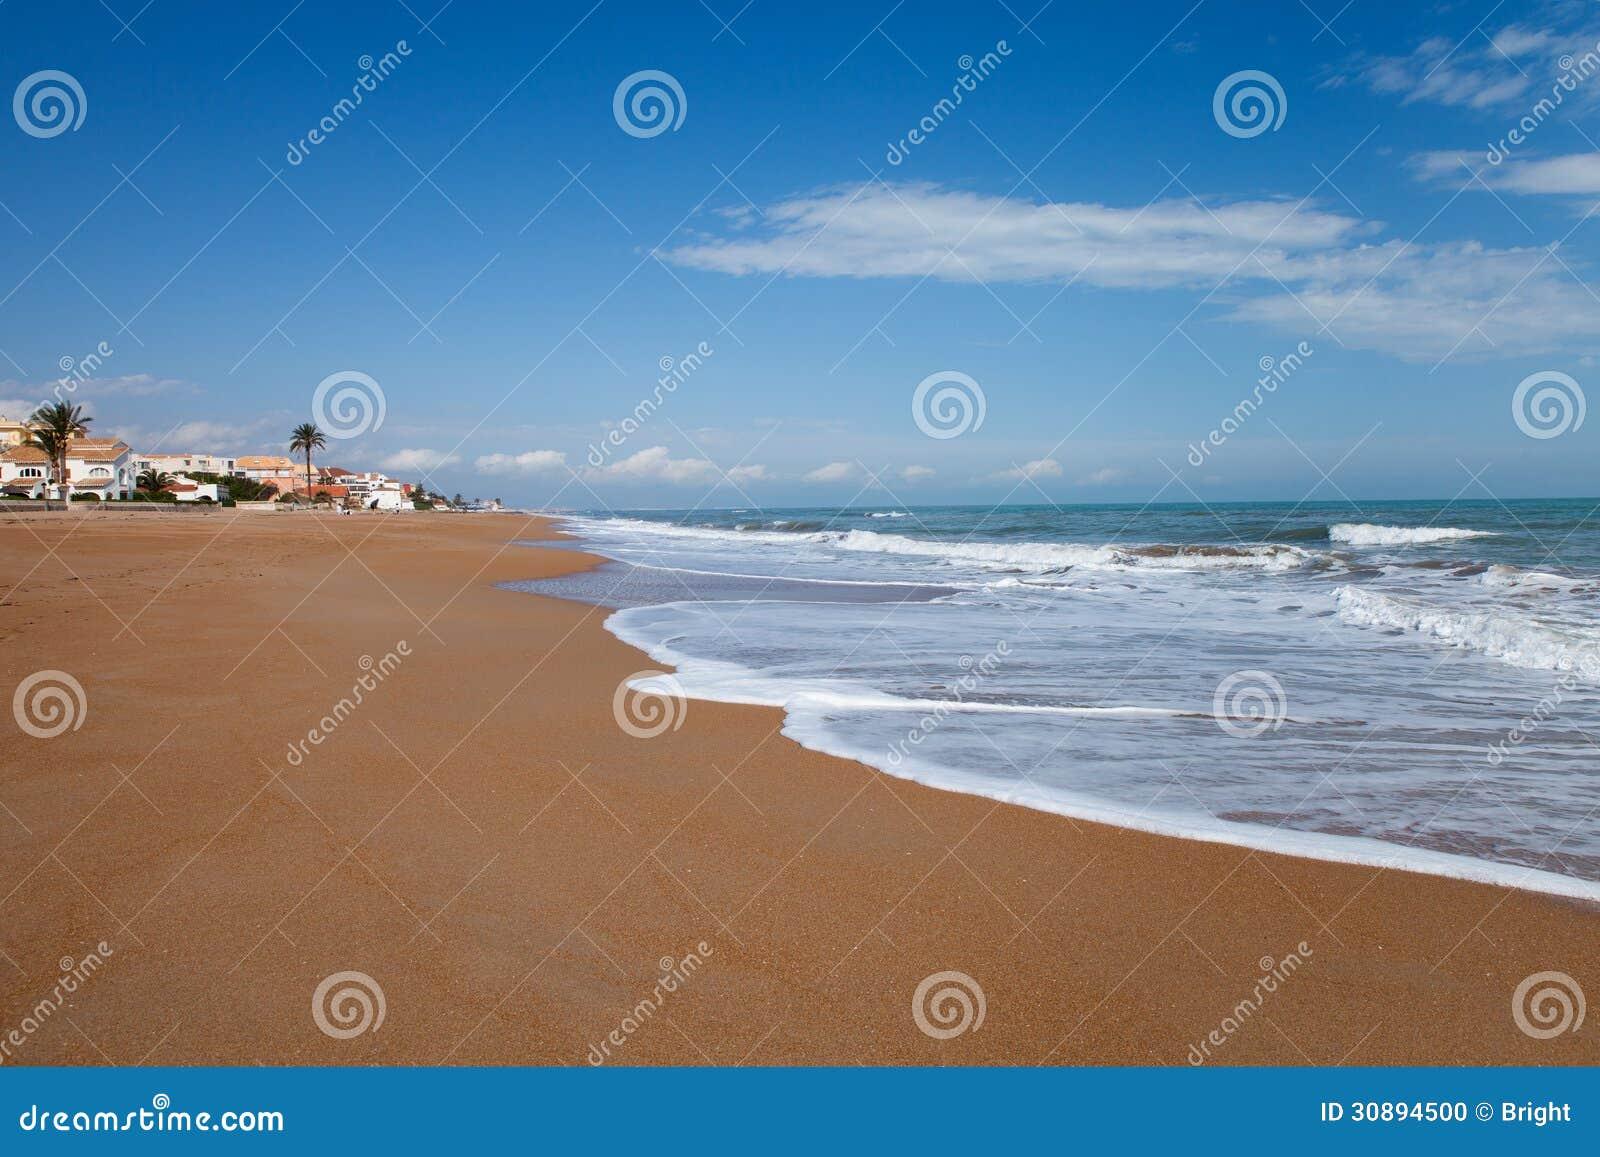 denia beach stock photo image of mediterranean water 30894500